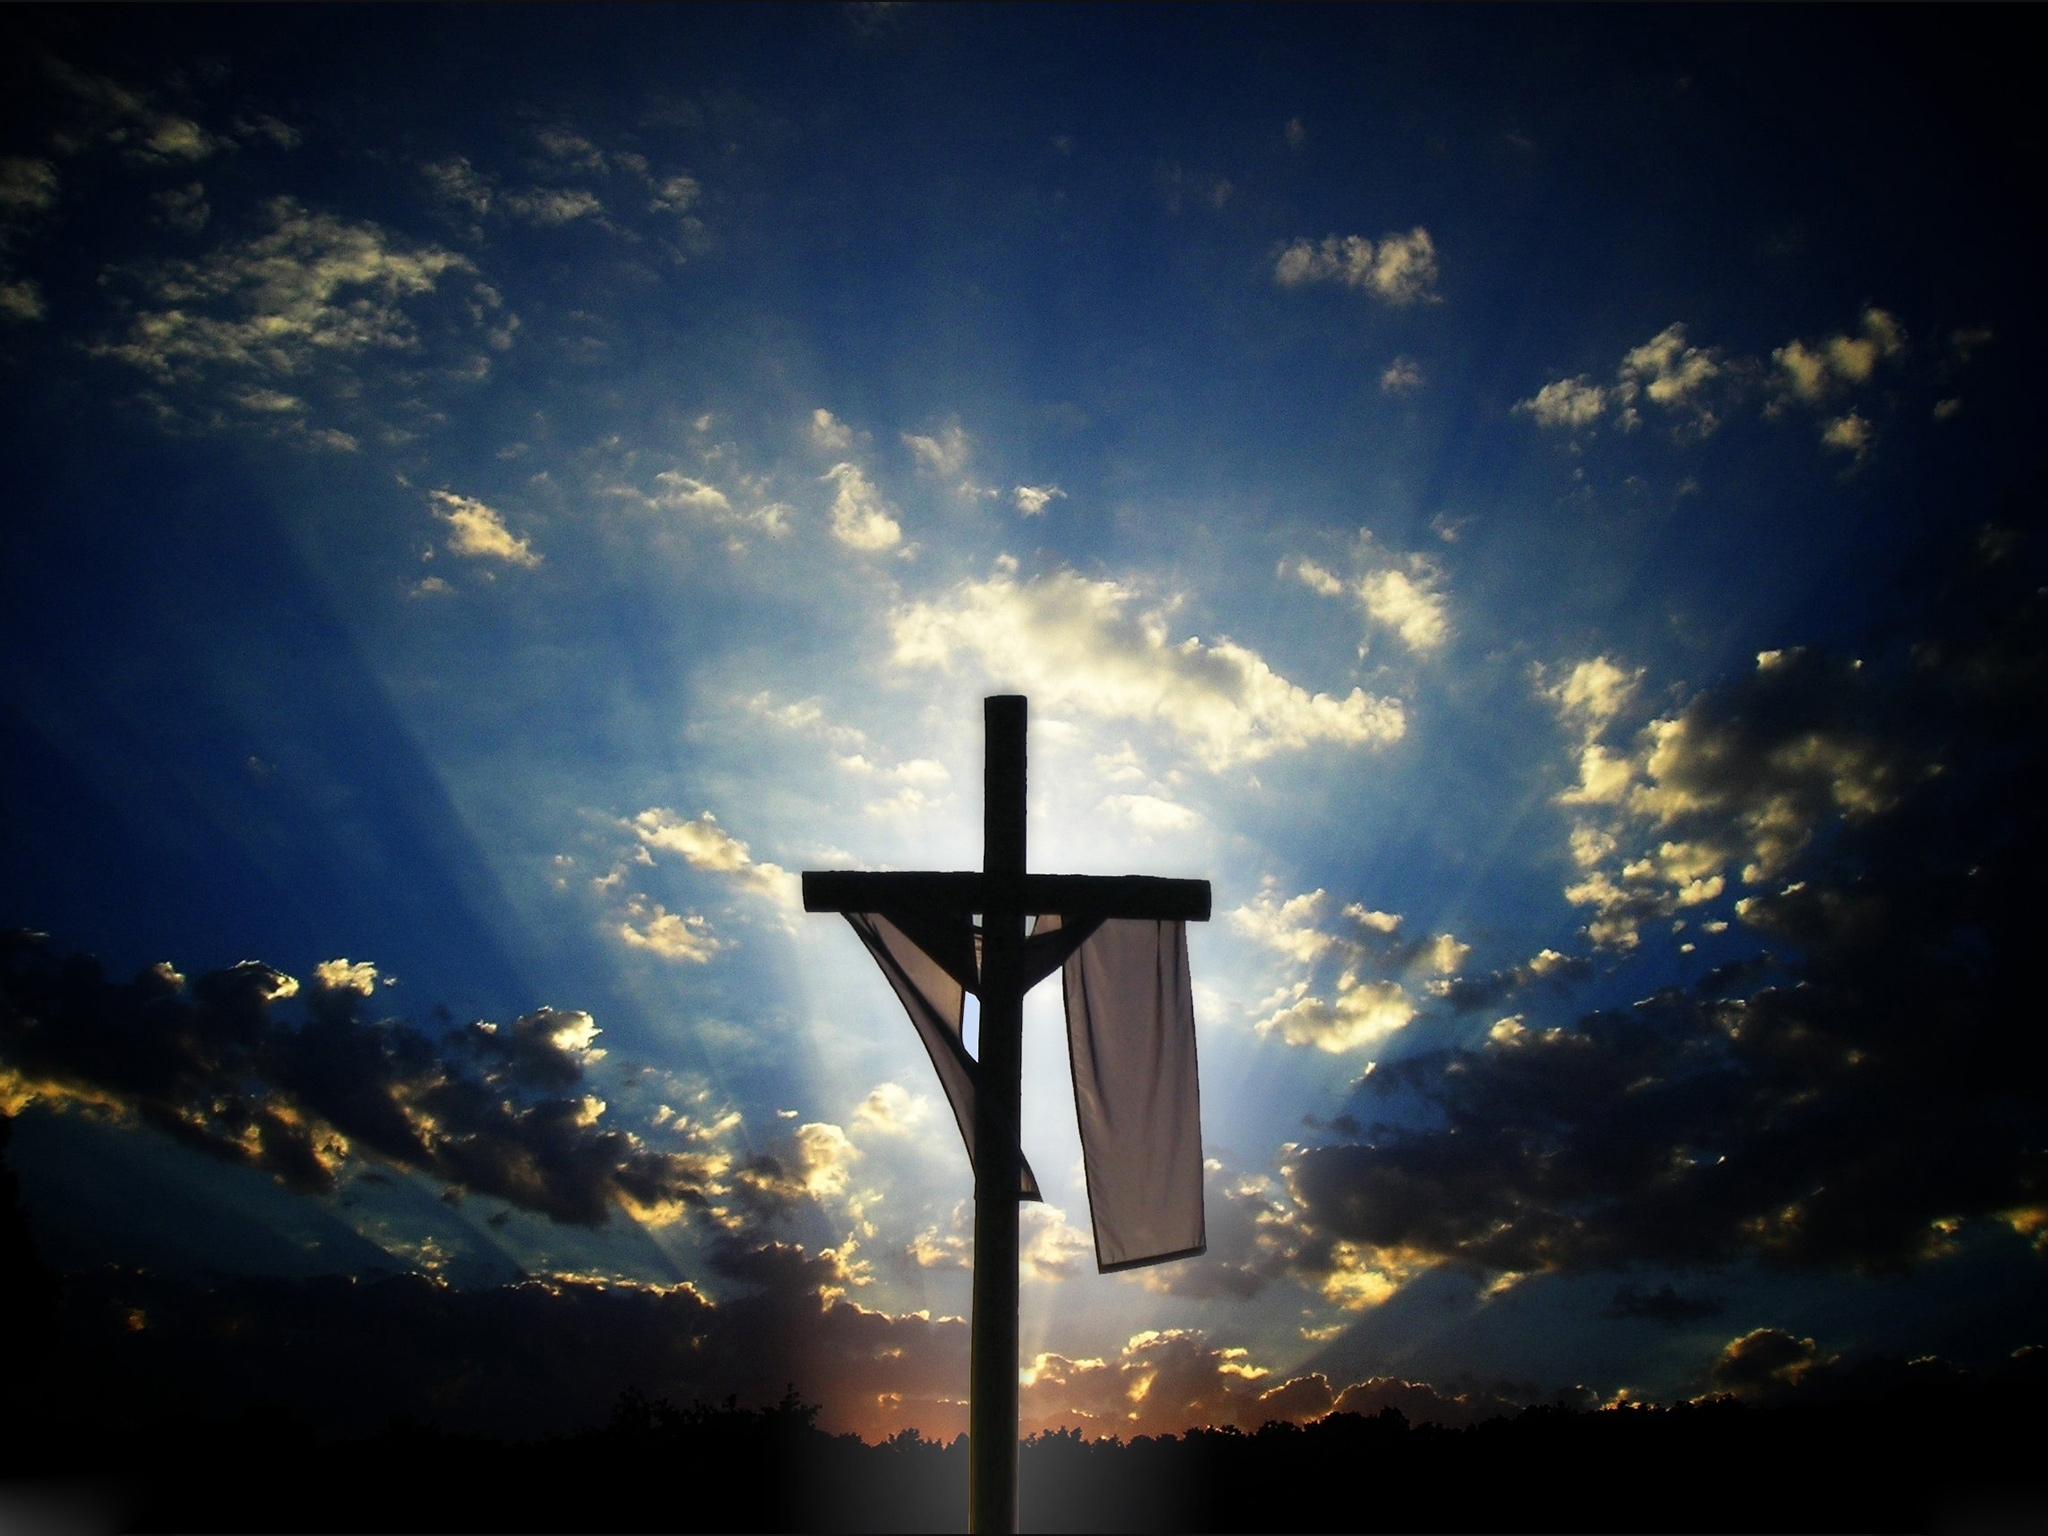 jesus christ cross images download